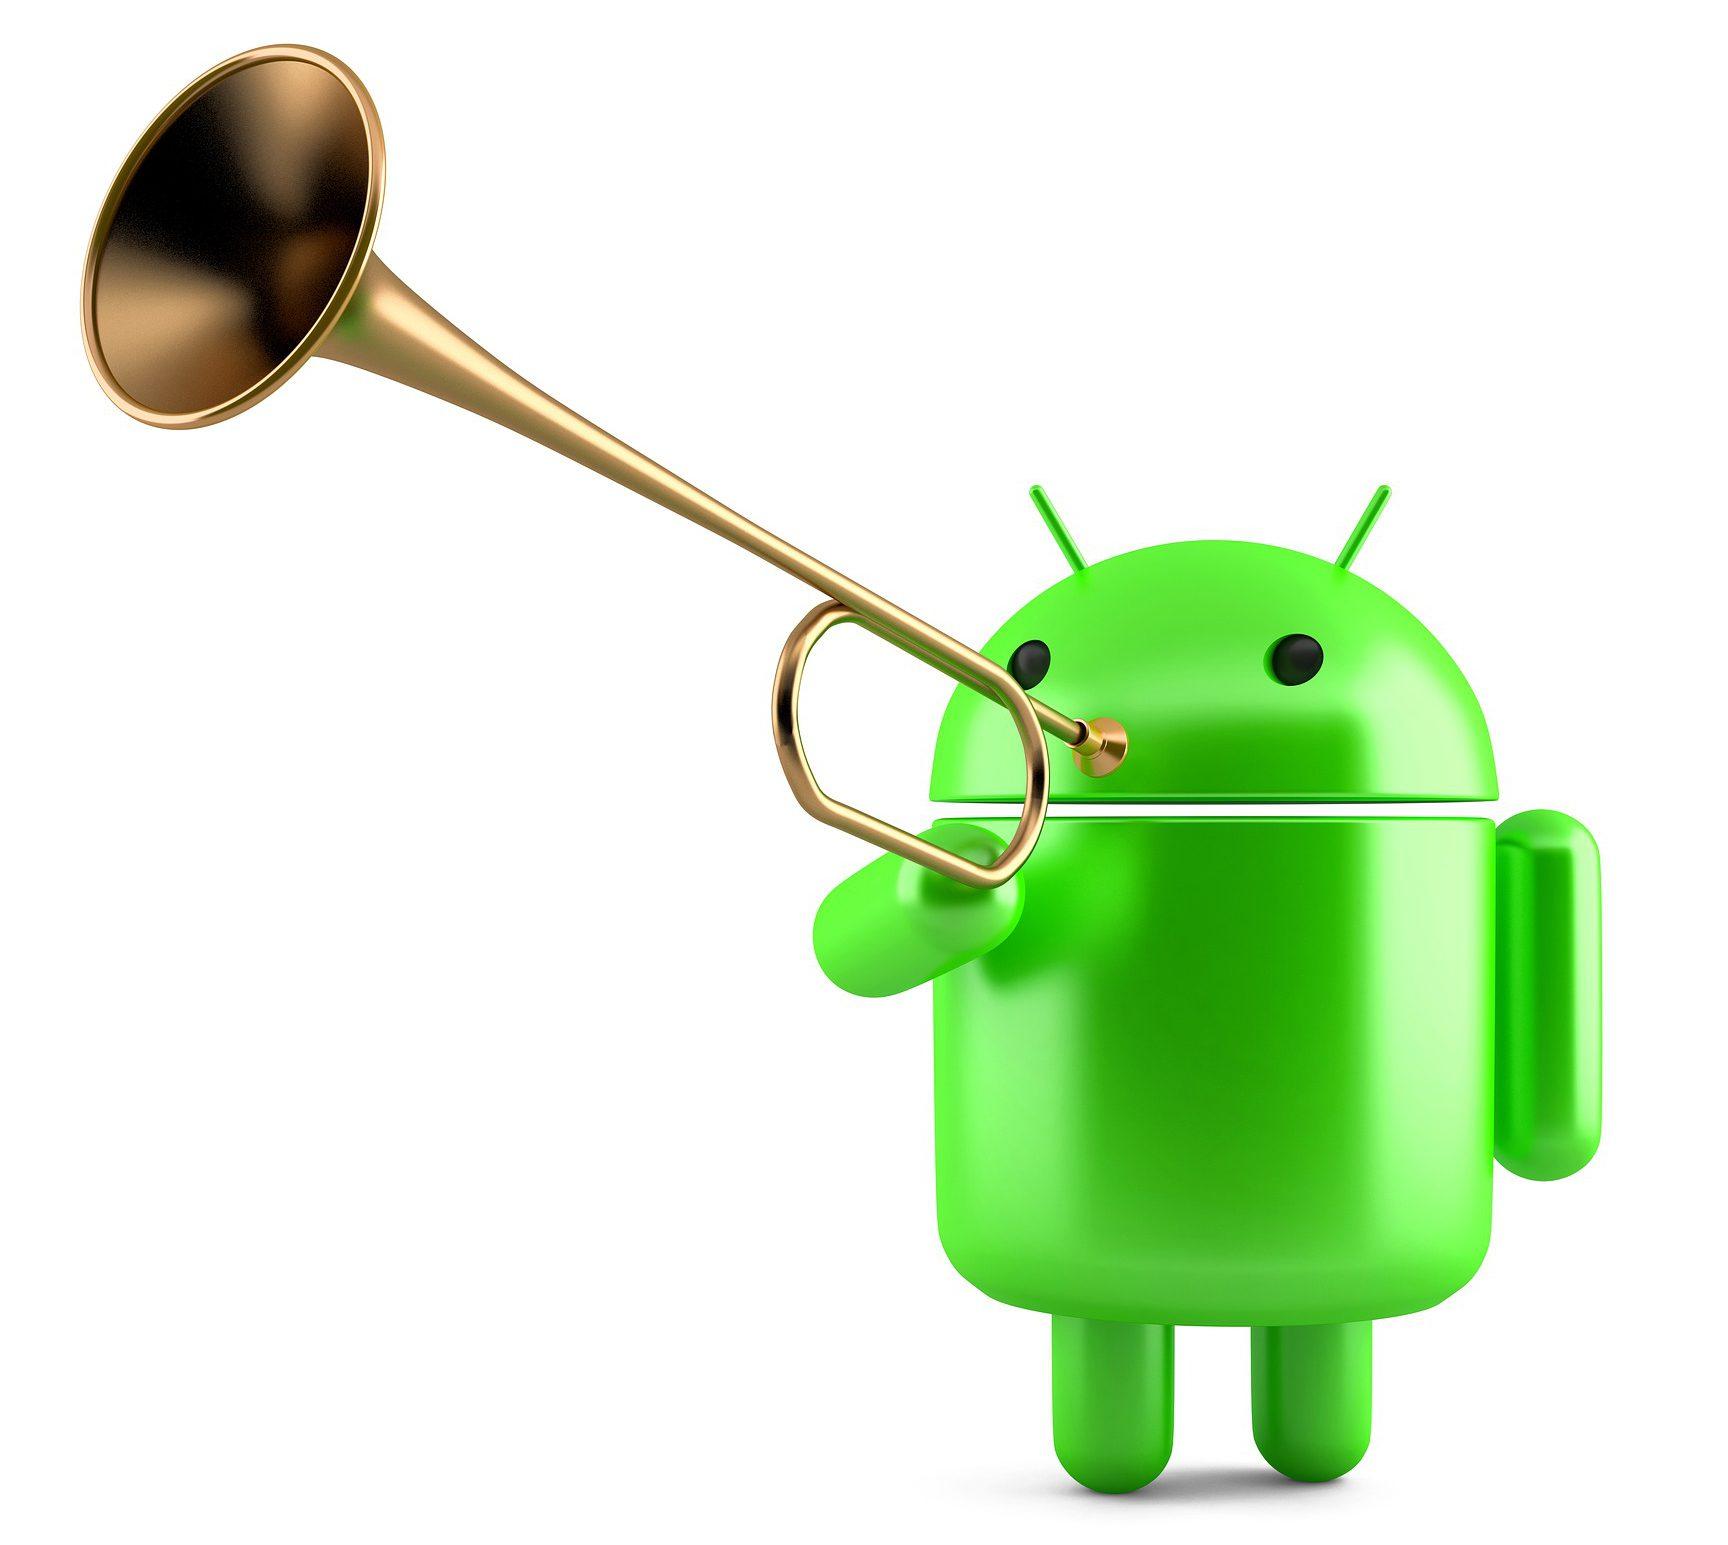 android icon pixabay free image CC0 3